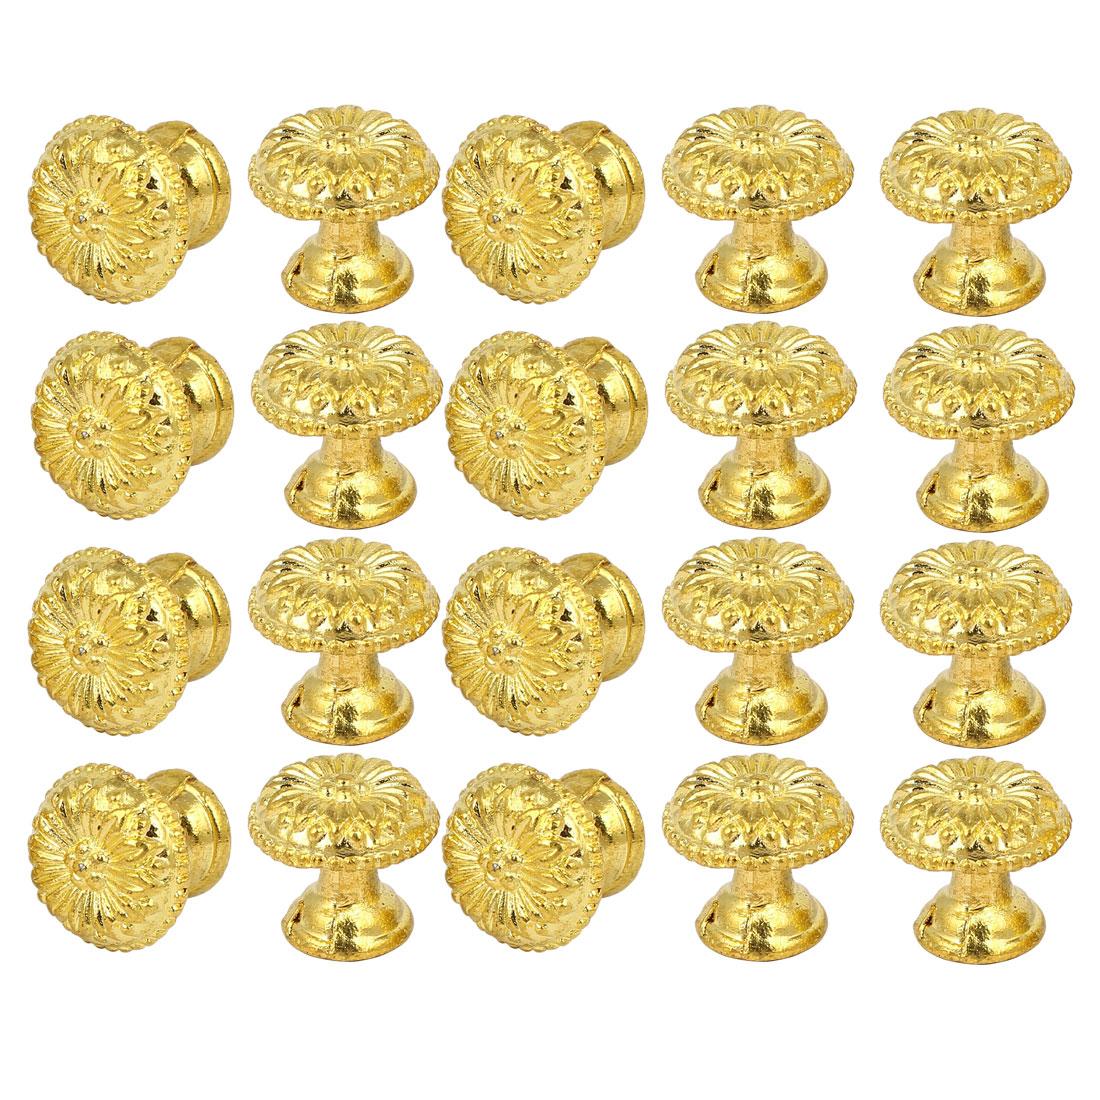 Cabinet Cupboard Dresser Single Hole Round Pull Knob Gold Tone 20PCS